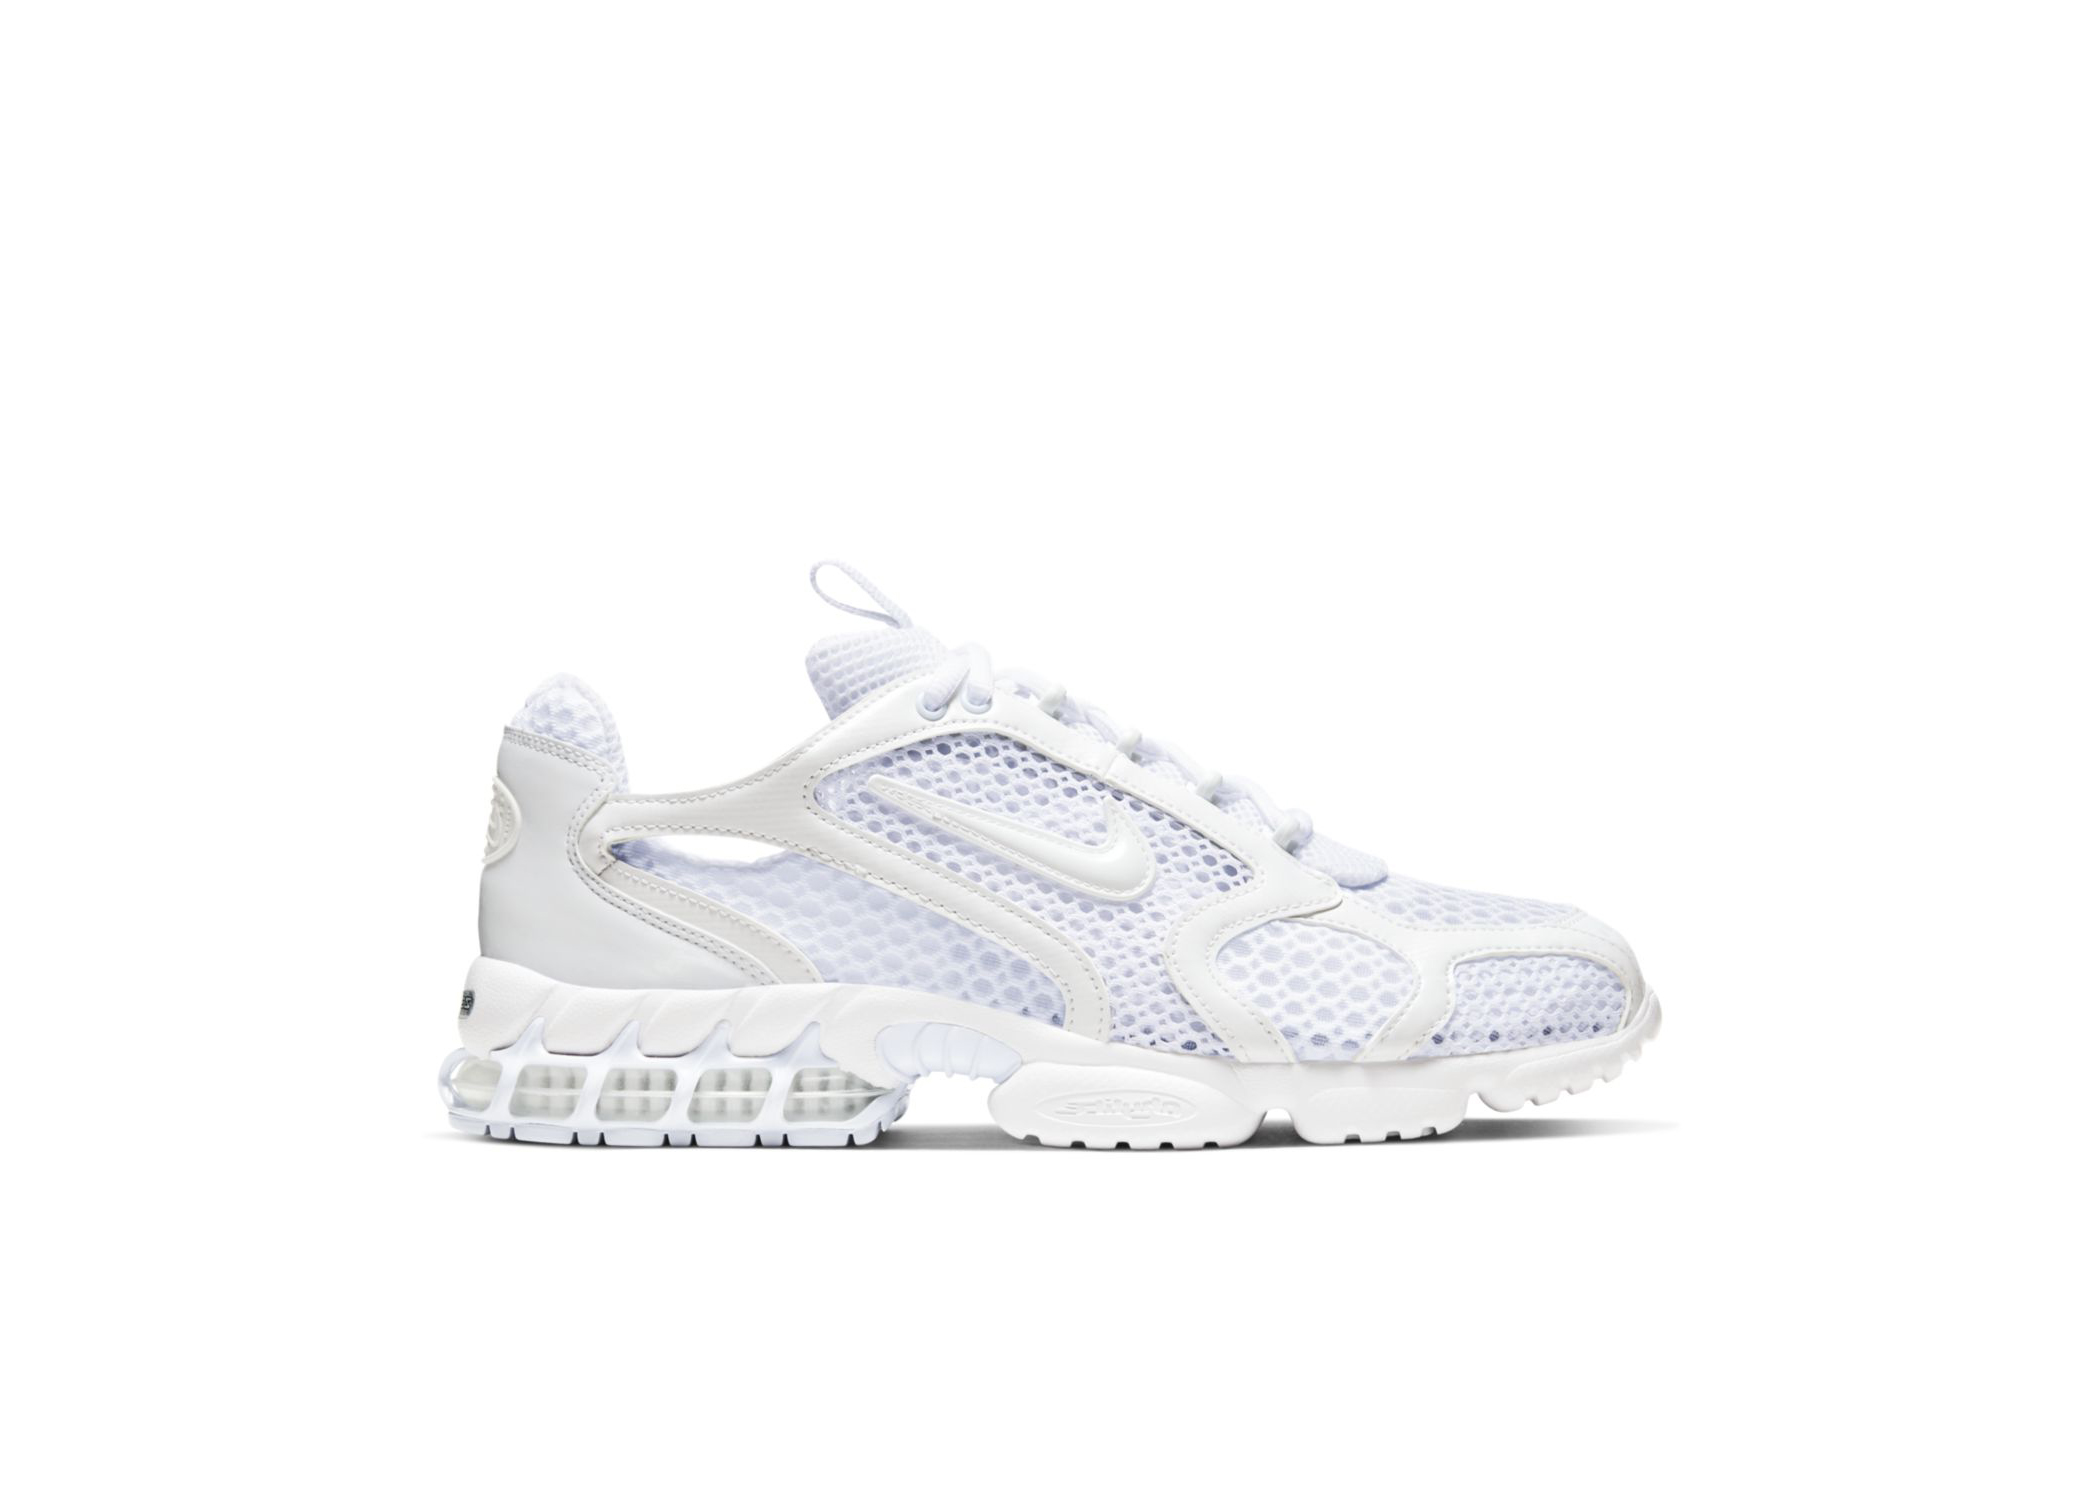 Nike Air Zoom Spiridon Cage 2 White